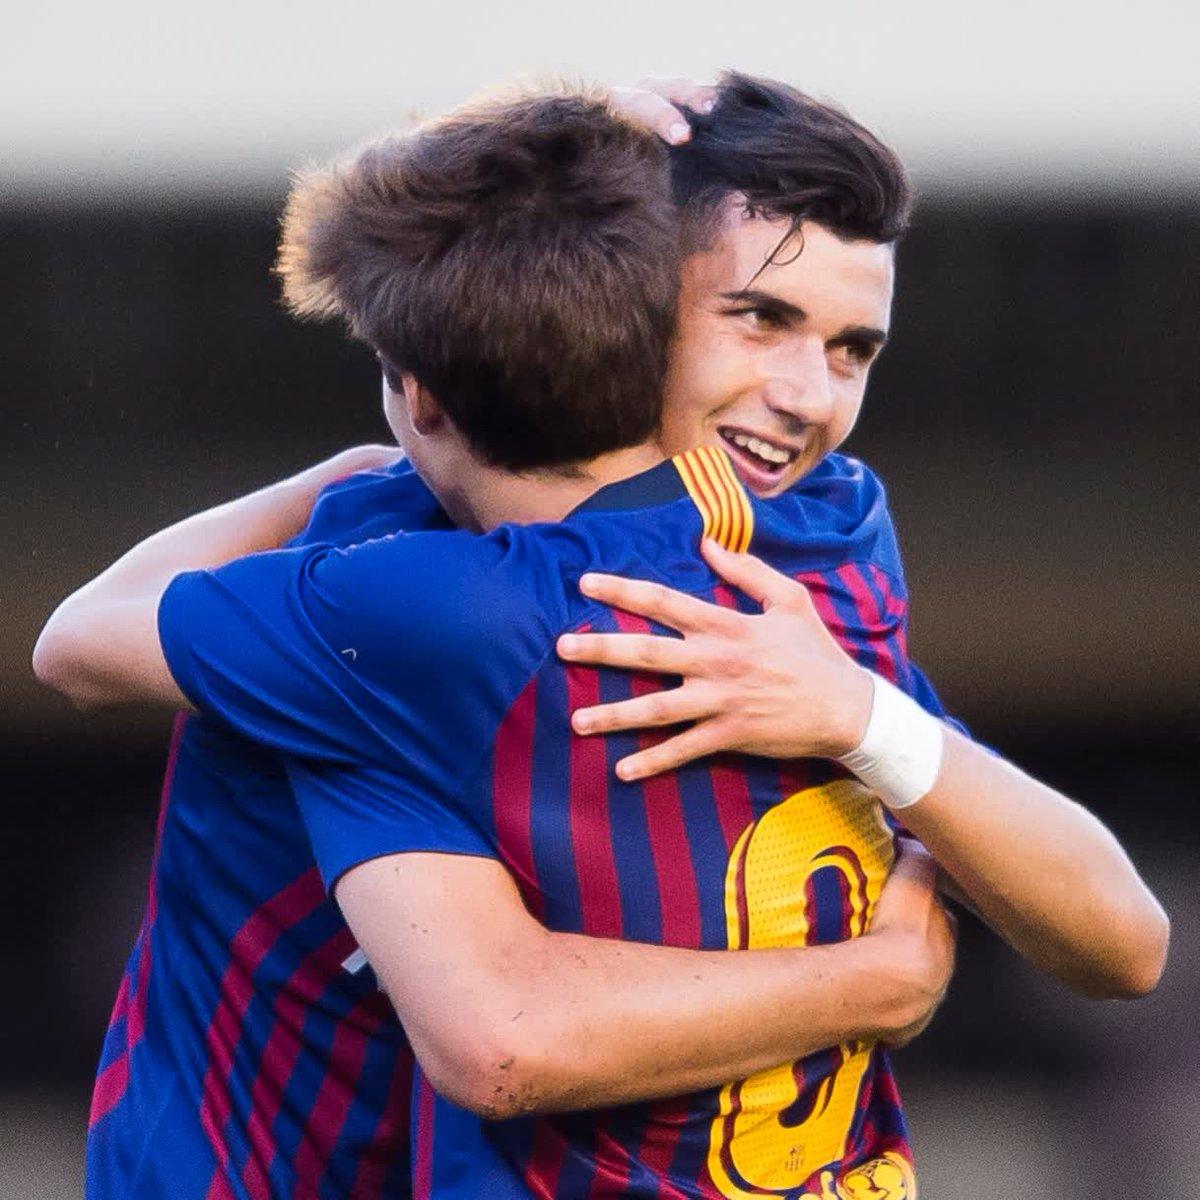 😲🔥👏 GUAU @FCBarcelonaB 👏🔥😲